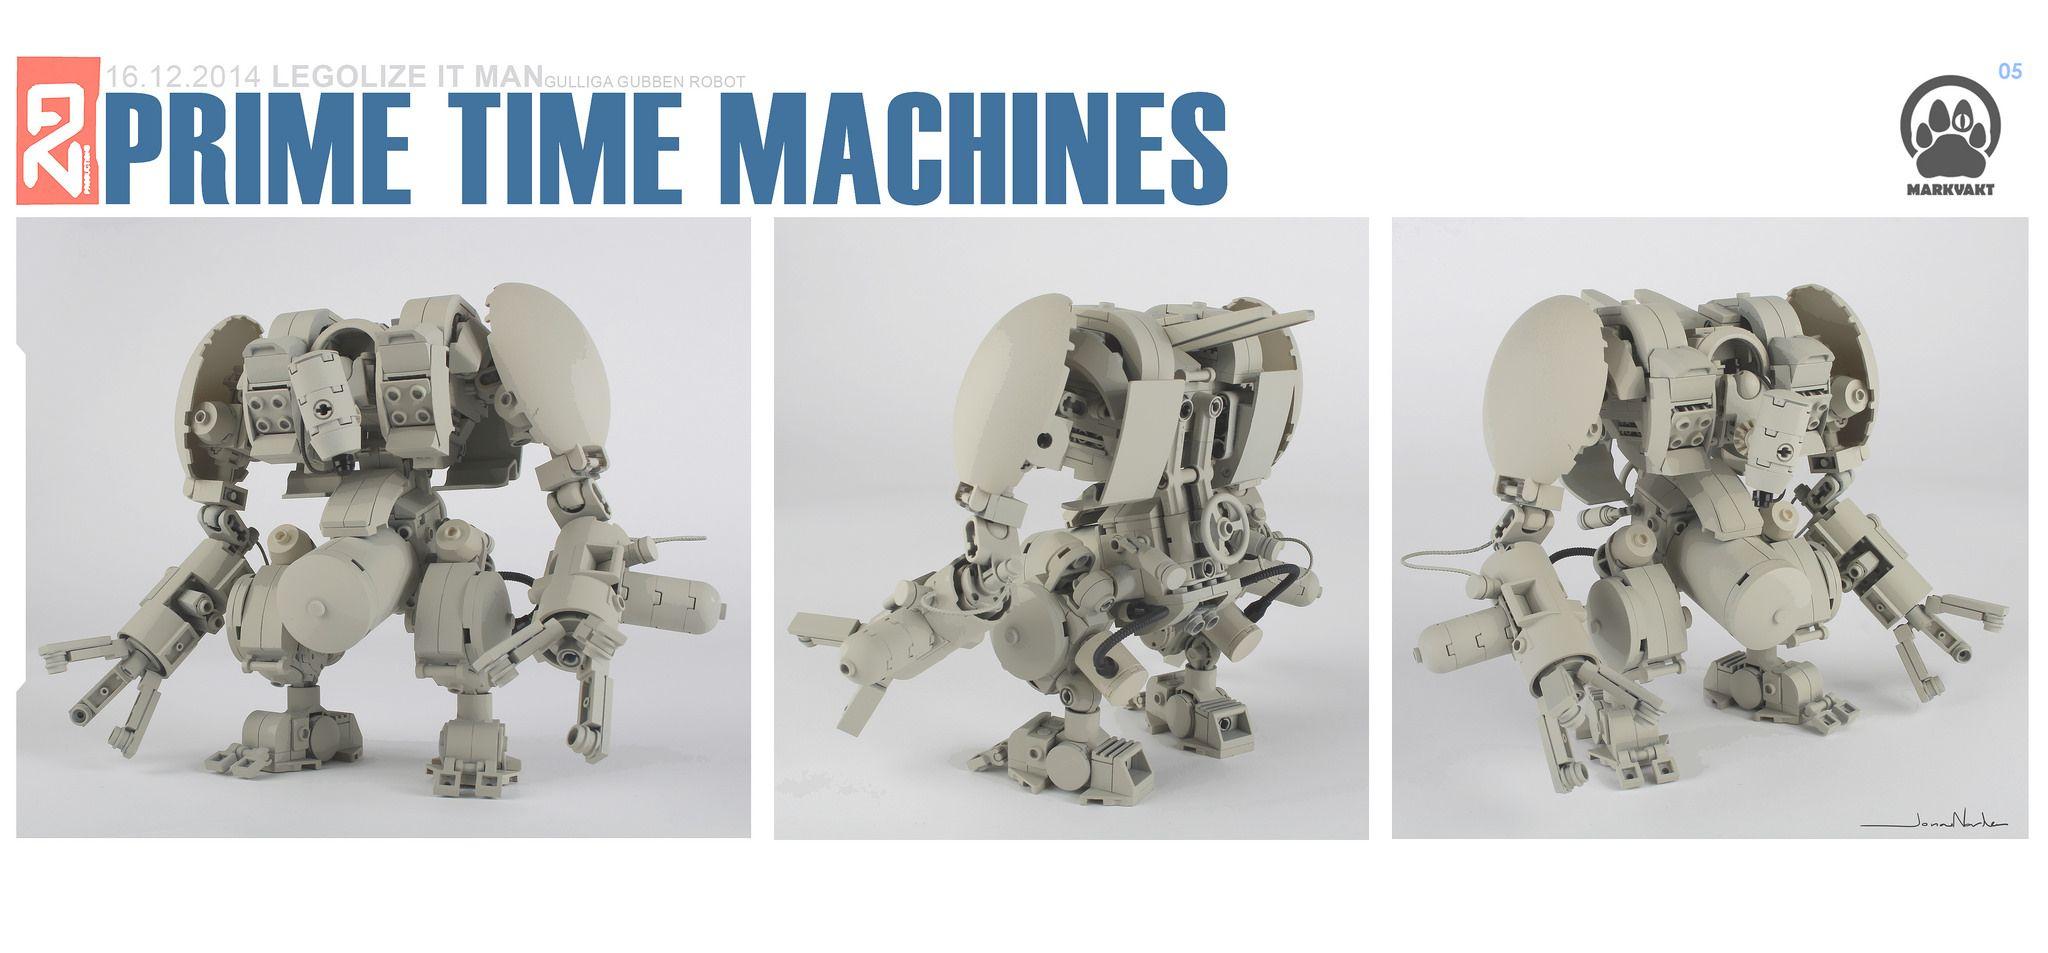 prime_time_01 by LEGOLIZE IT MAN